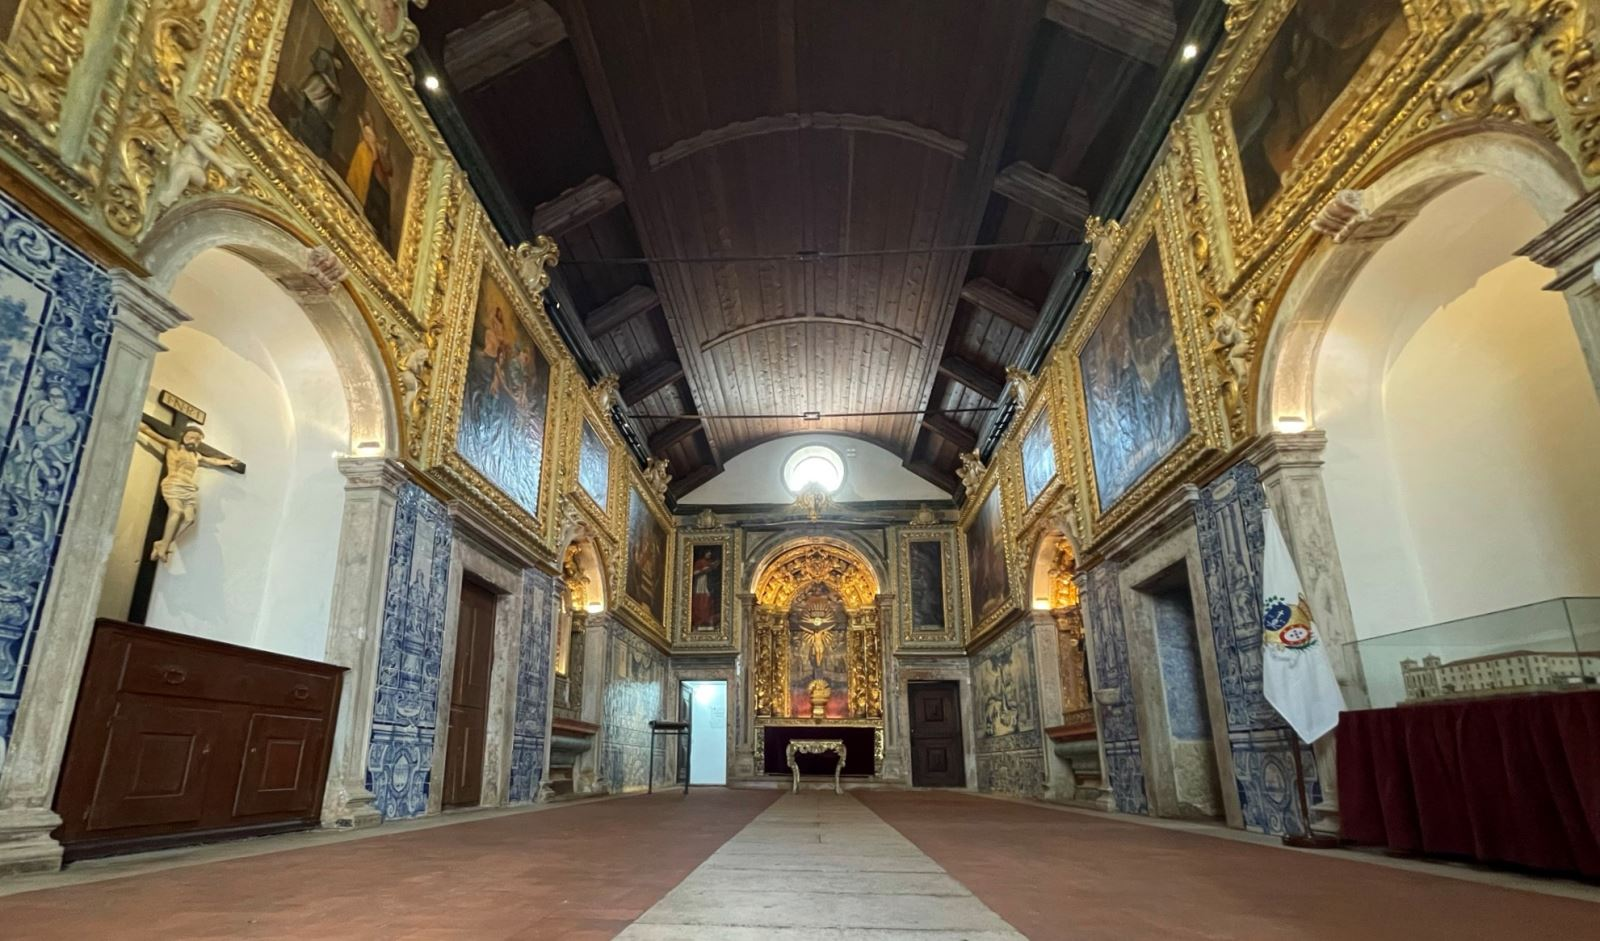 Santarém | Joia da arte barroca nacional que merece ser visitada